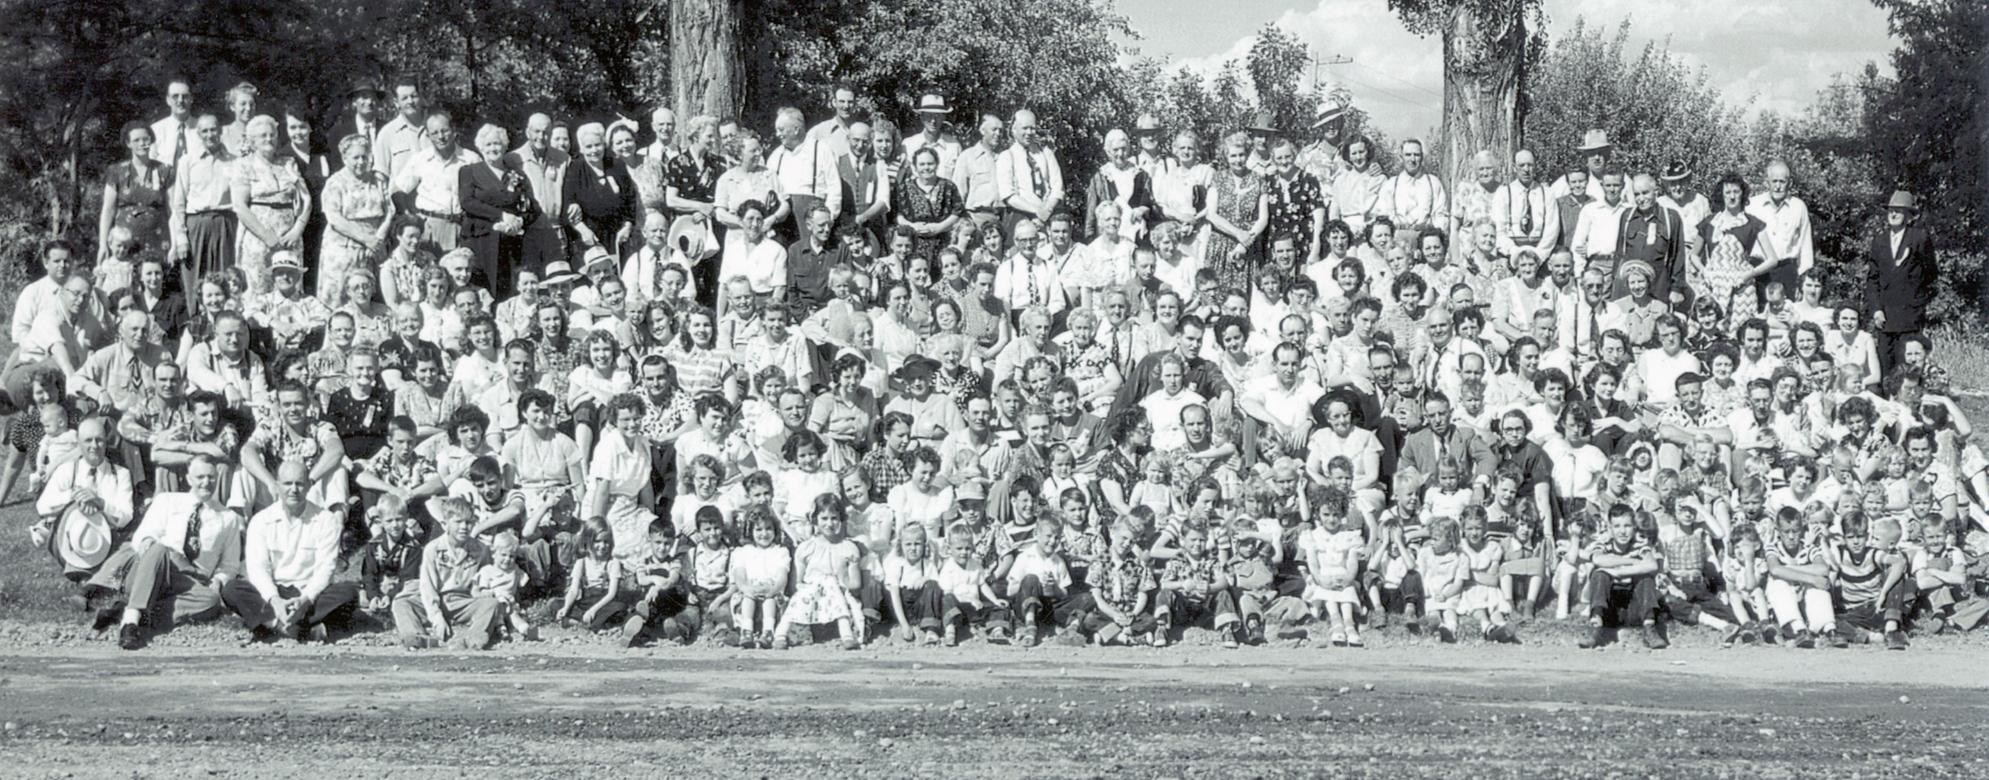 fam-org-reunions-slide-3-tolman-reunion-1951-idaho-falls